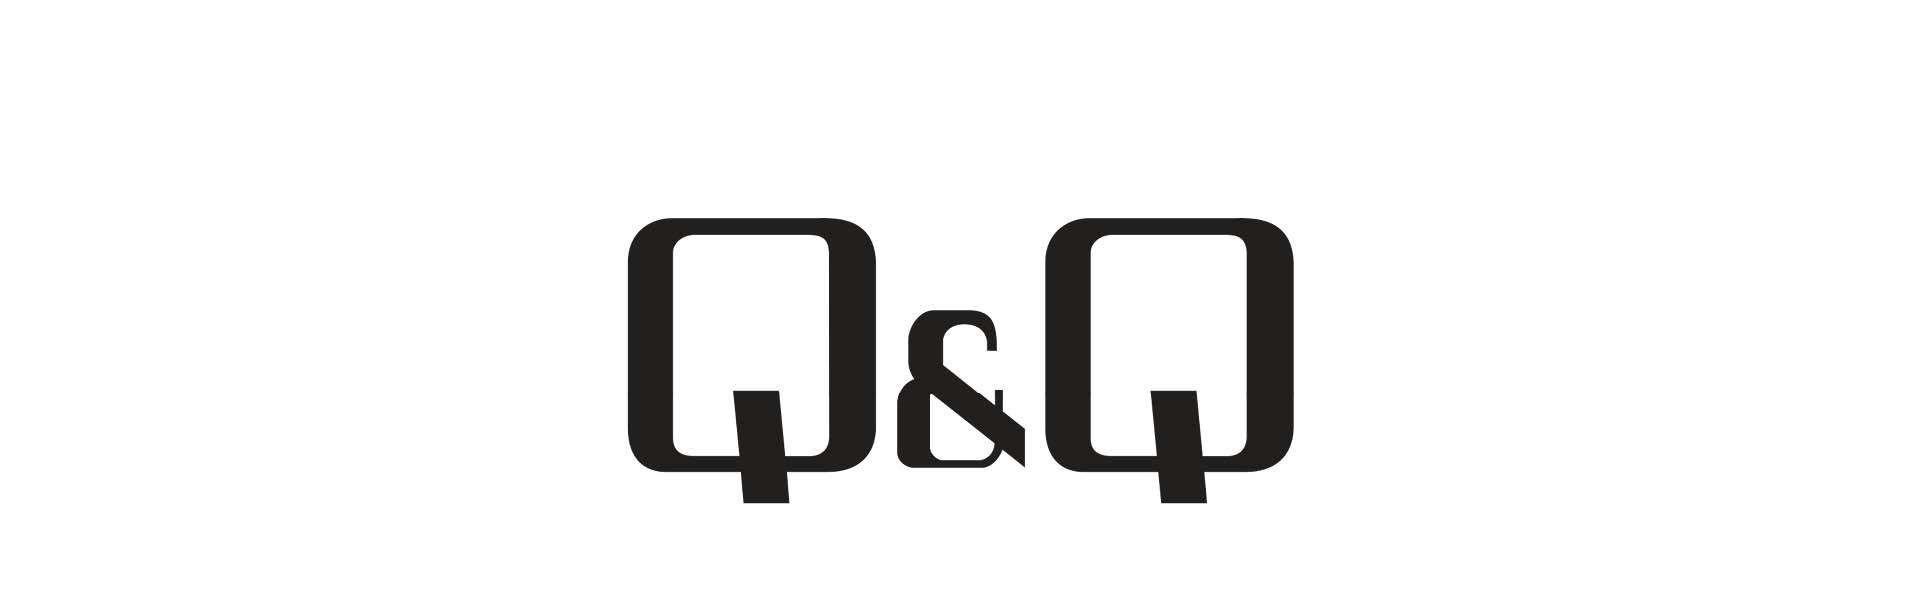 De mooiste unisex horloges van Q&Q!